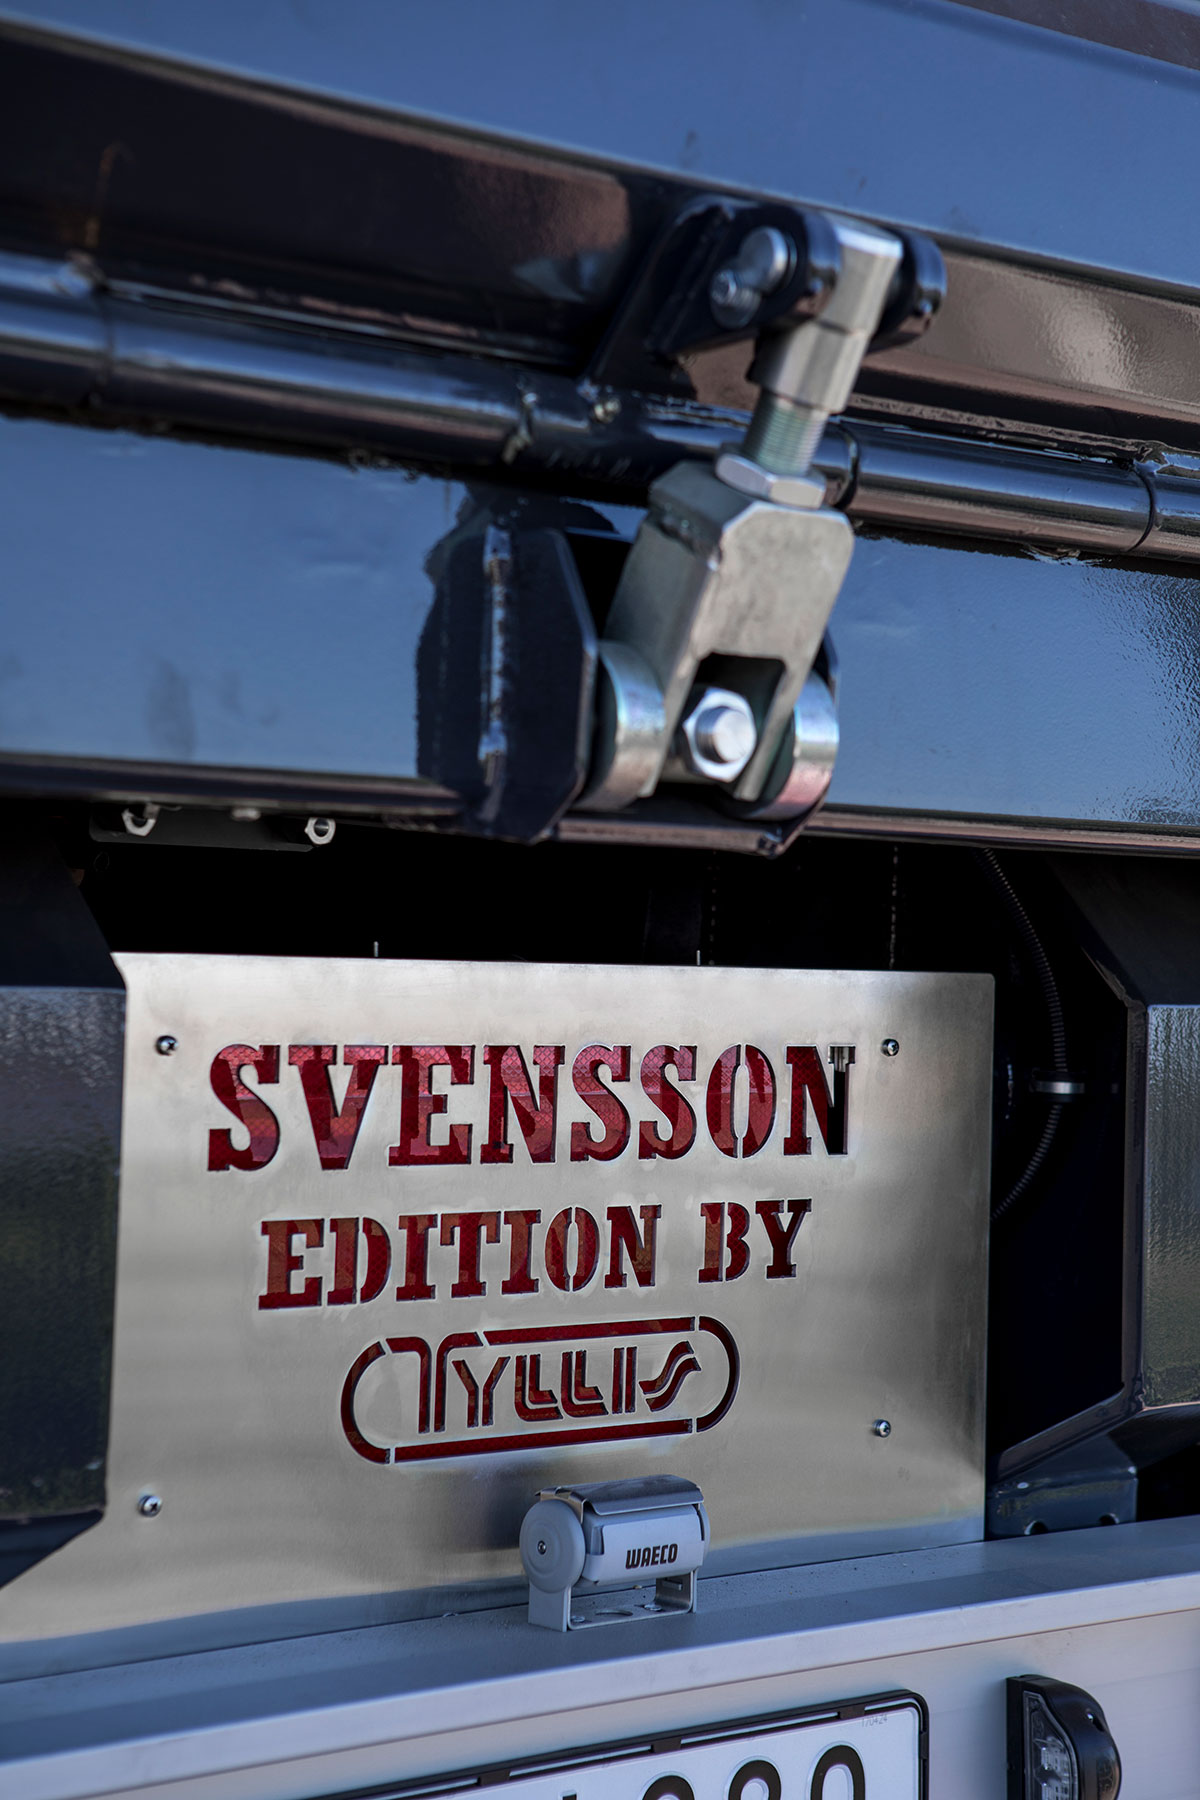 Svensson Edition